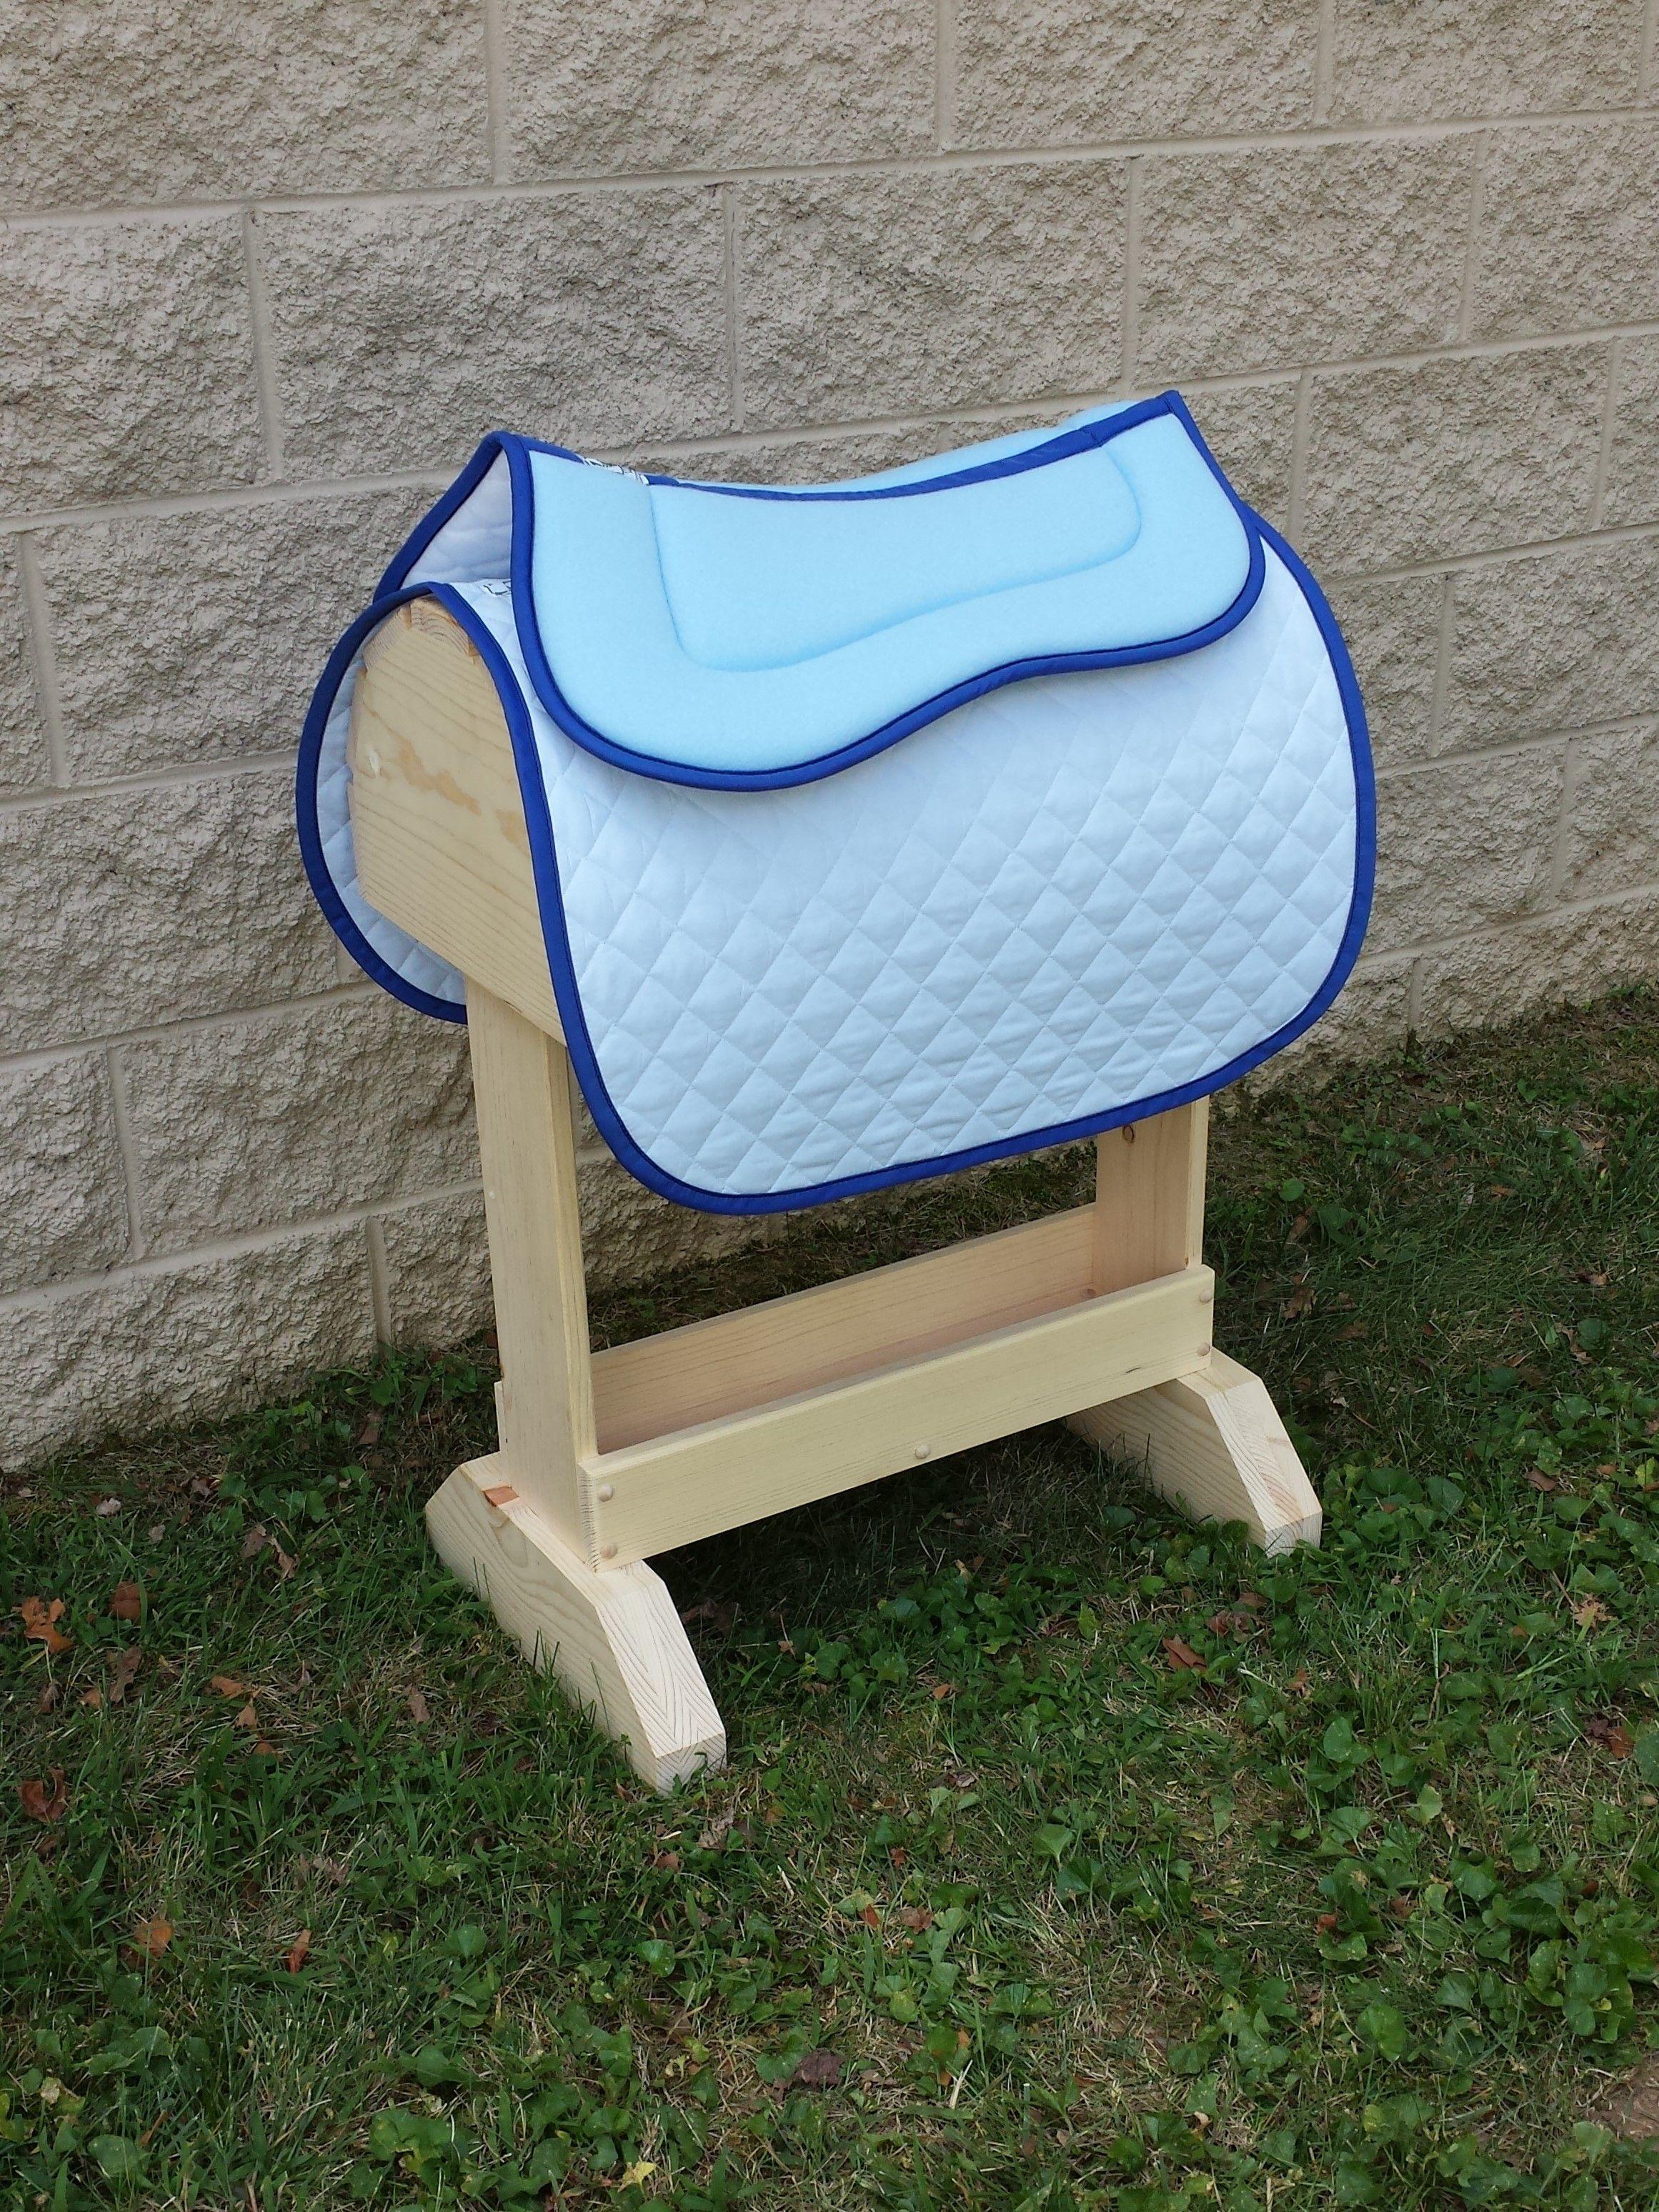 Light Blue With Royal Blue Trim Half Pad And Baby Pad Shop Wilkers Com Custom Saddle Pad Saddle Pads Saddle Pads English